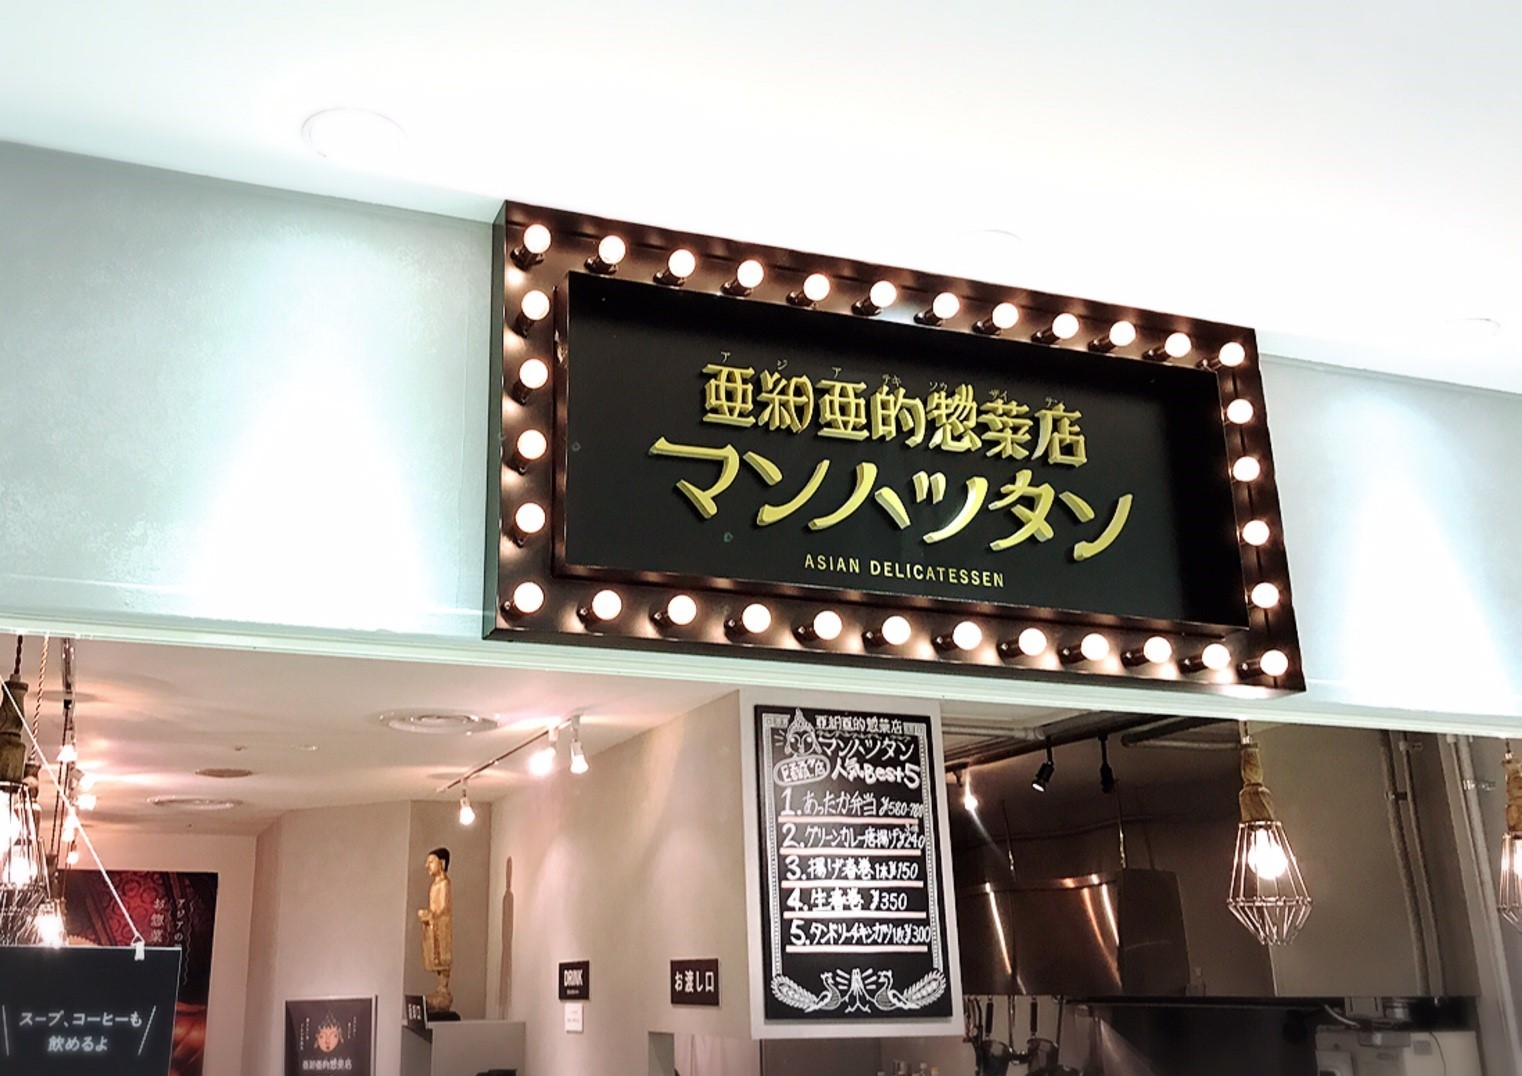 亜細亜的惣菜店 マンハッタン/札幌市 厚別区_c0378174_13101599.jpg